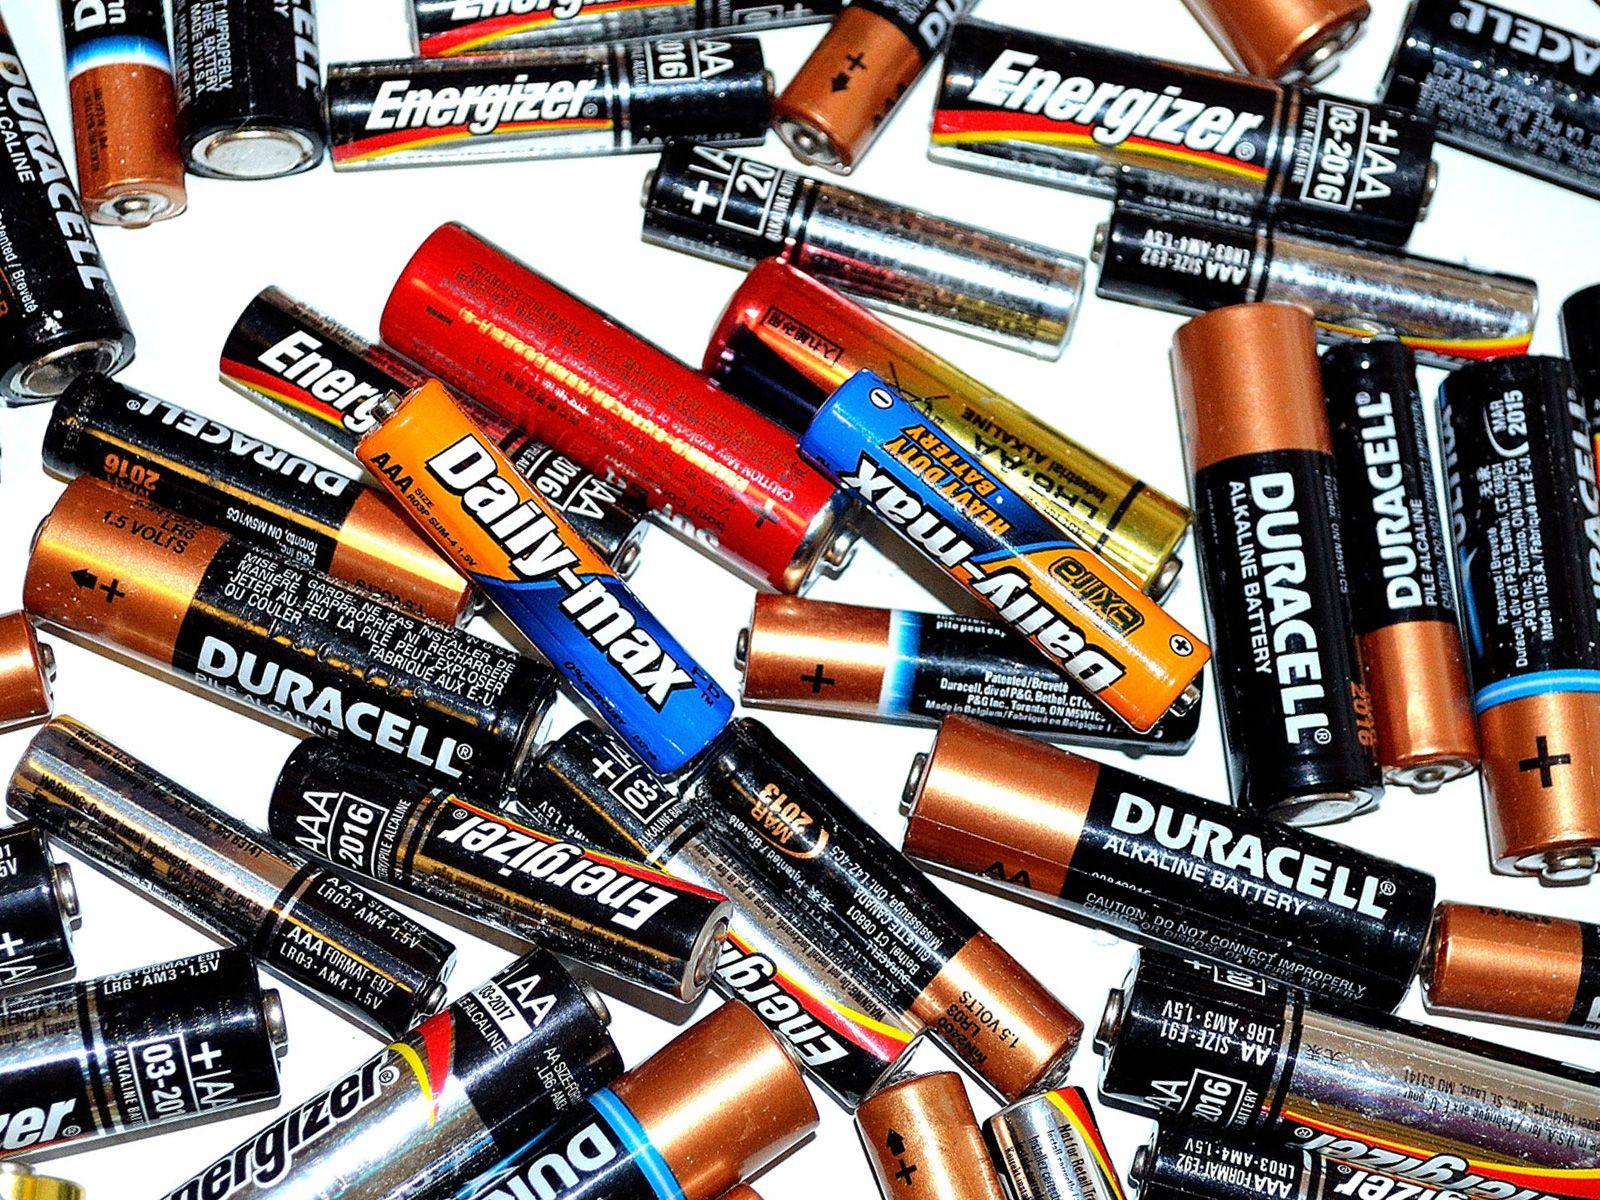 De juiste batterij